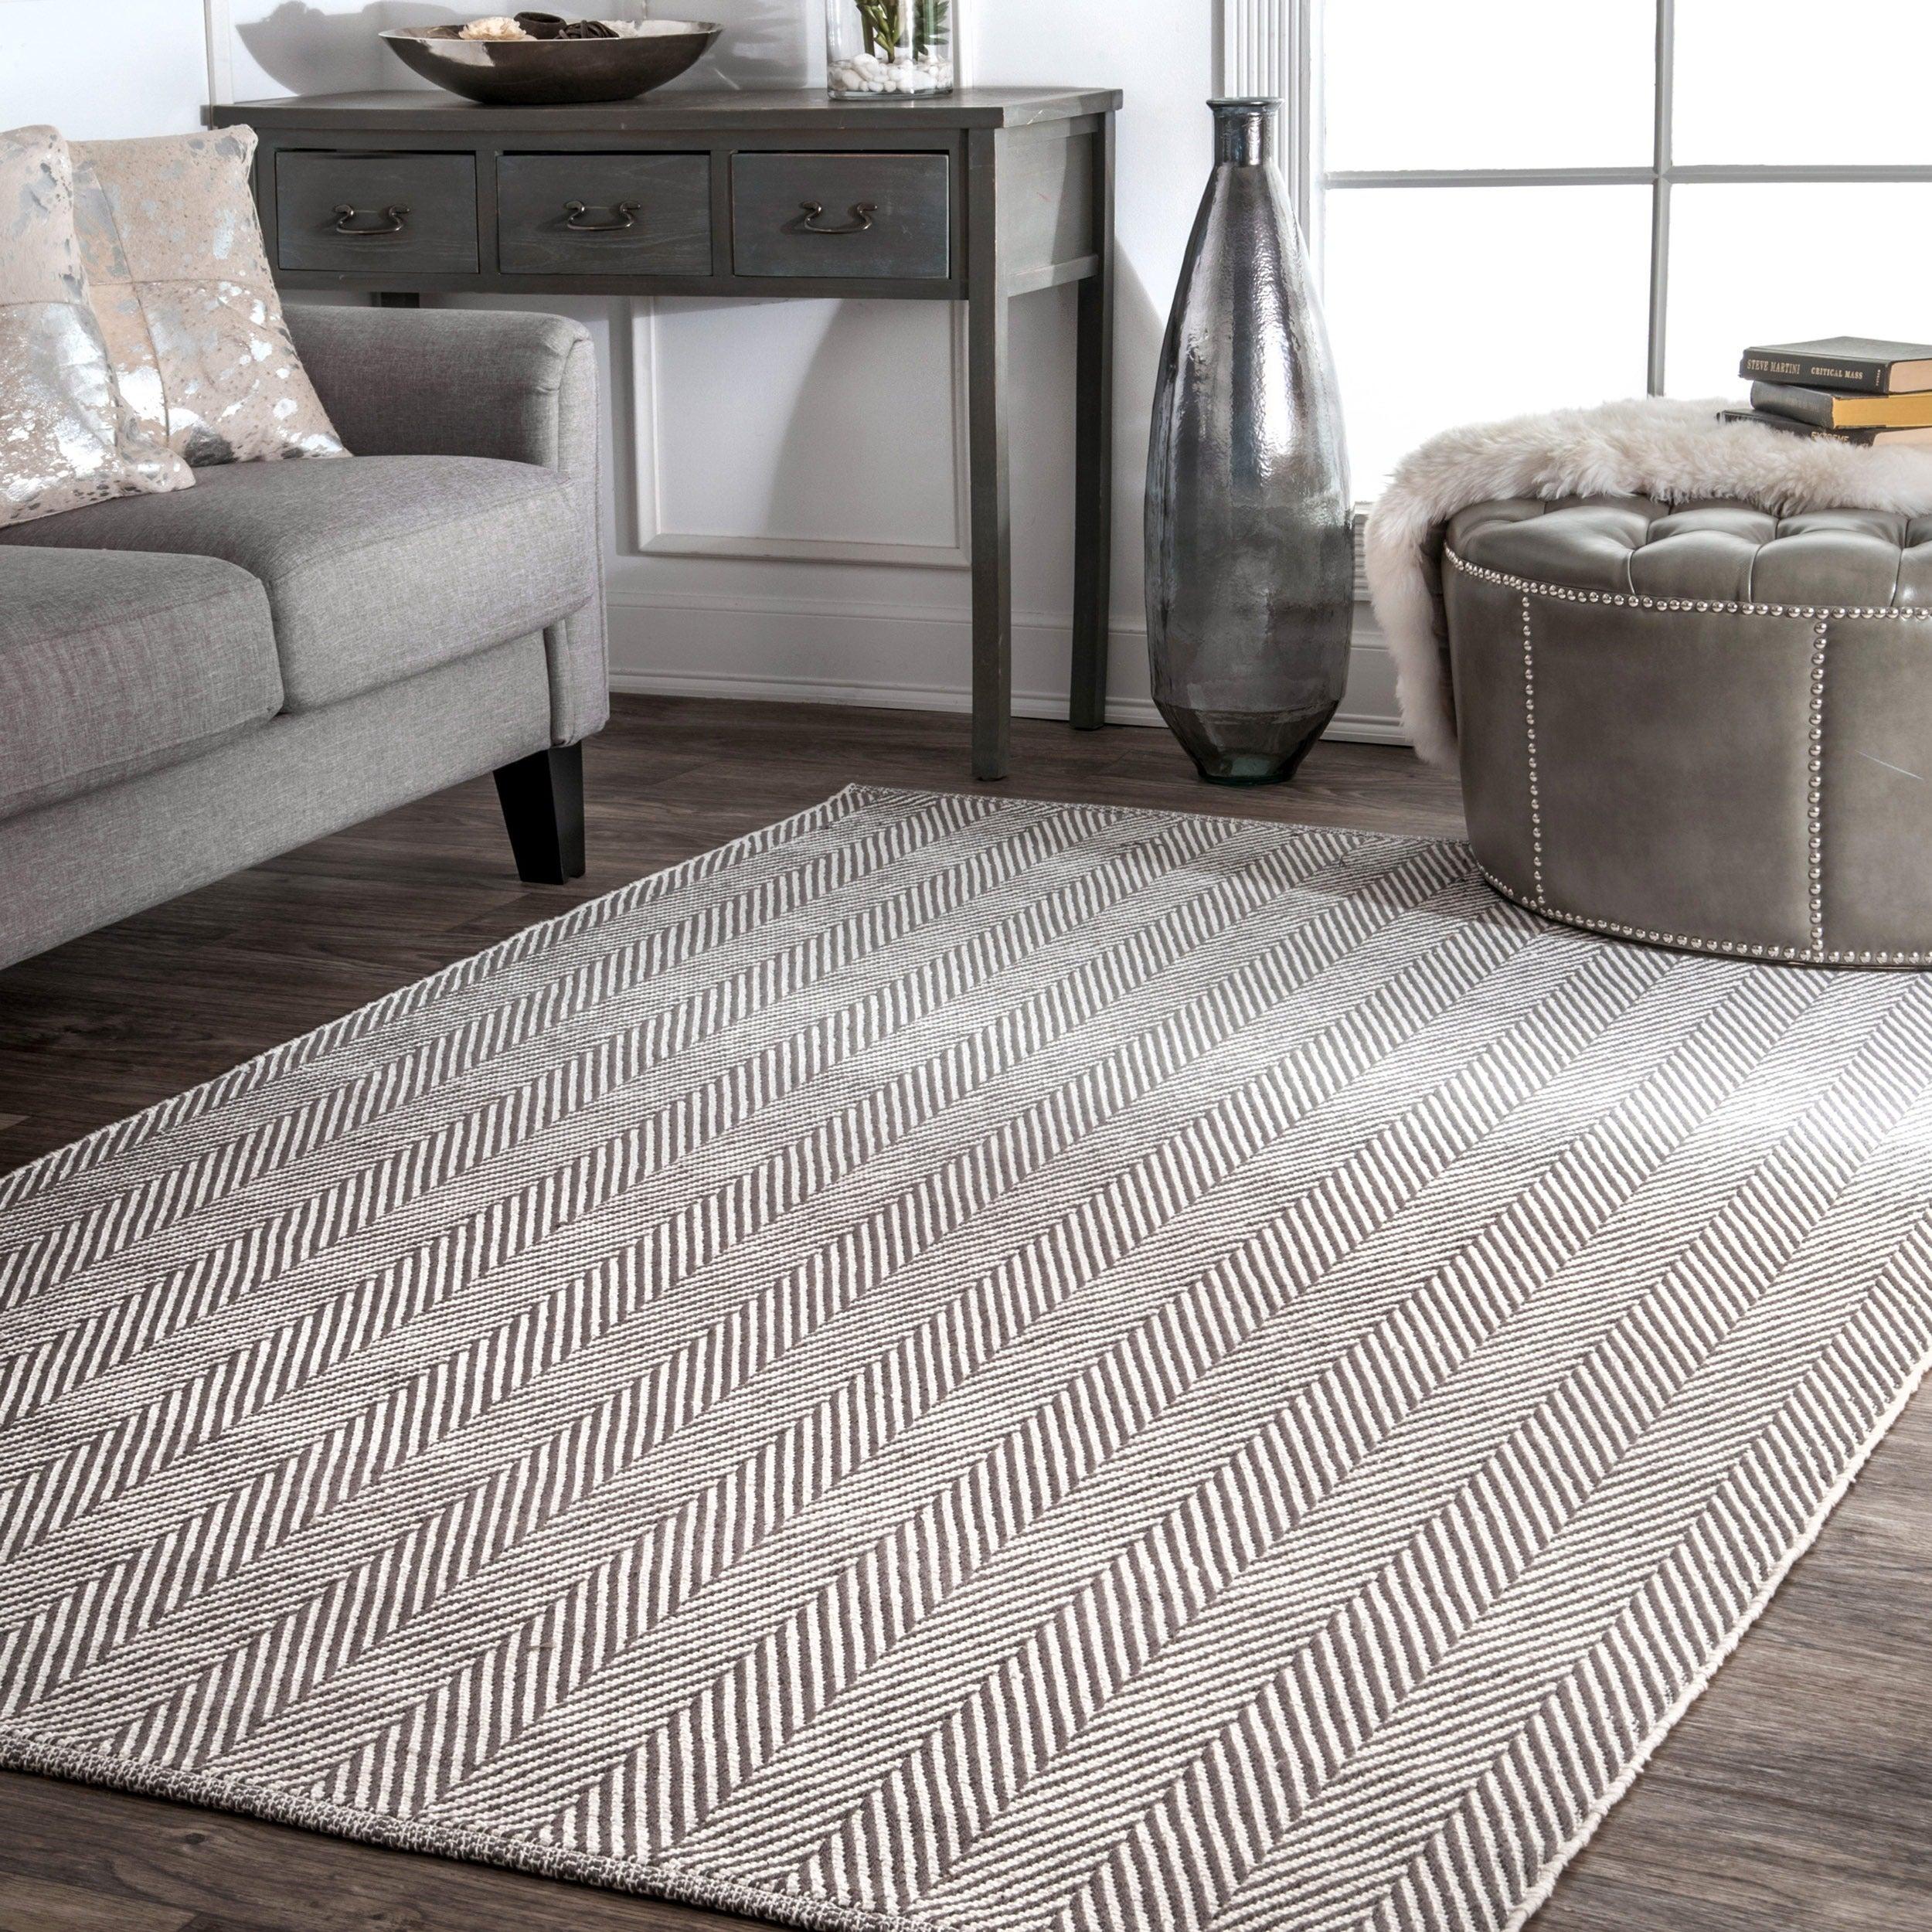 New Small Large Flat Weave Anti Slip Kitchen Rug Hall Runner